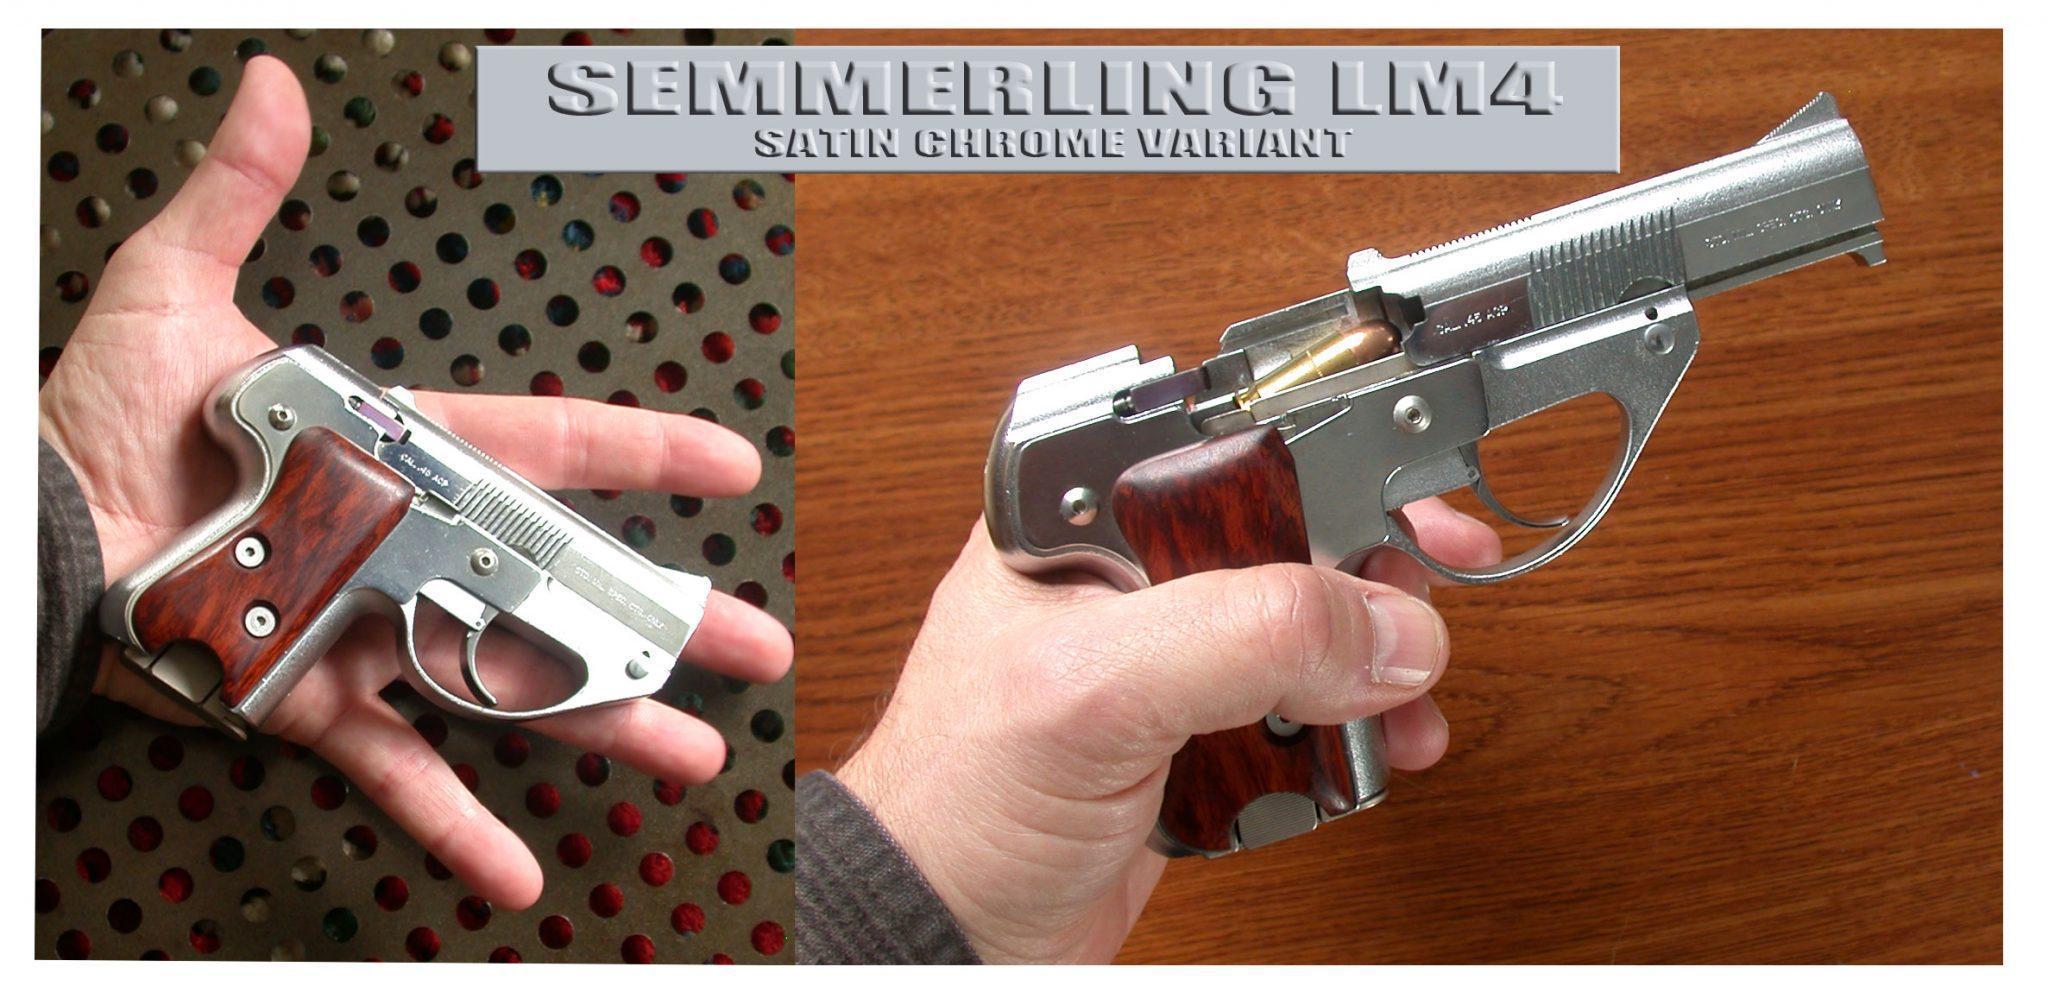 Semmerling LM-4 defensive weapon